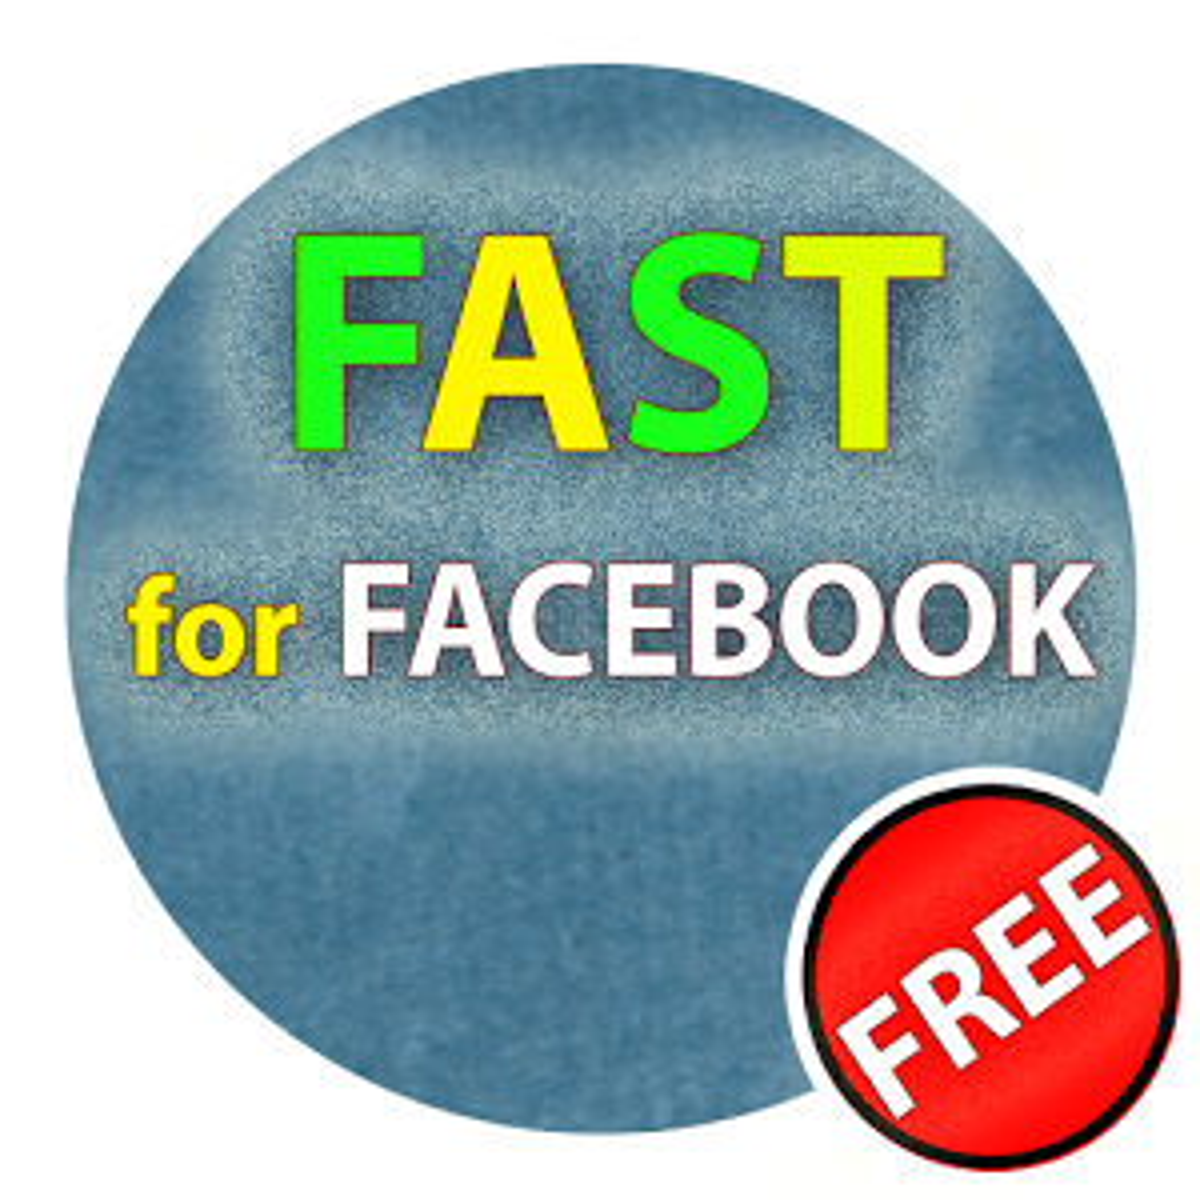 FastLova for Facebook 1.1.2